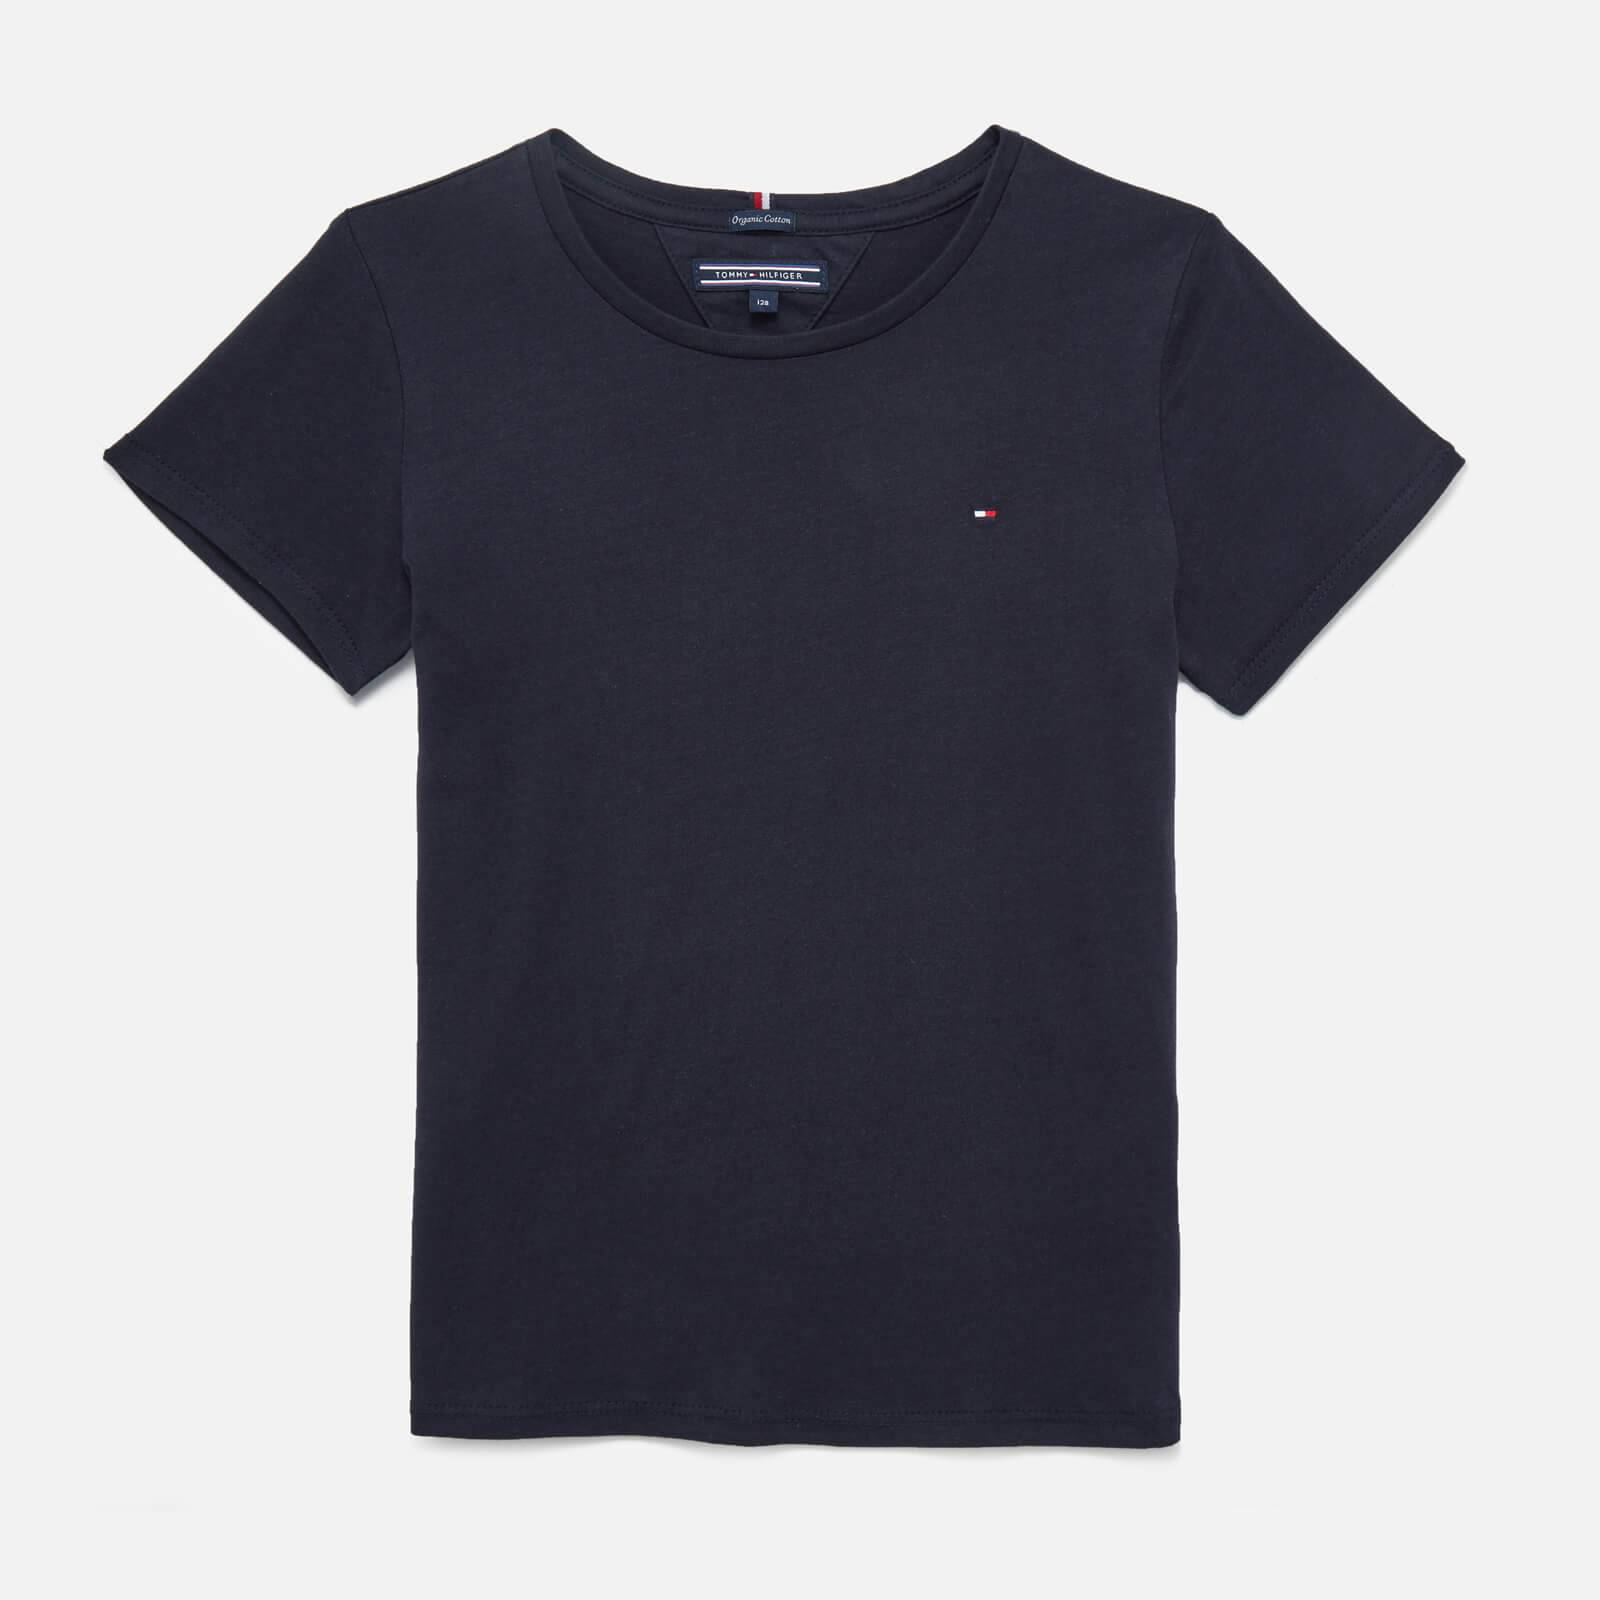 Tommy Kids Girls' Short Sleeve T-Shirt - Sky Captain - 8 Years